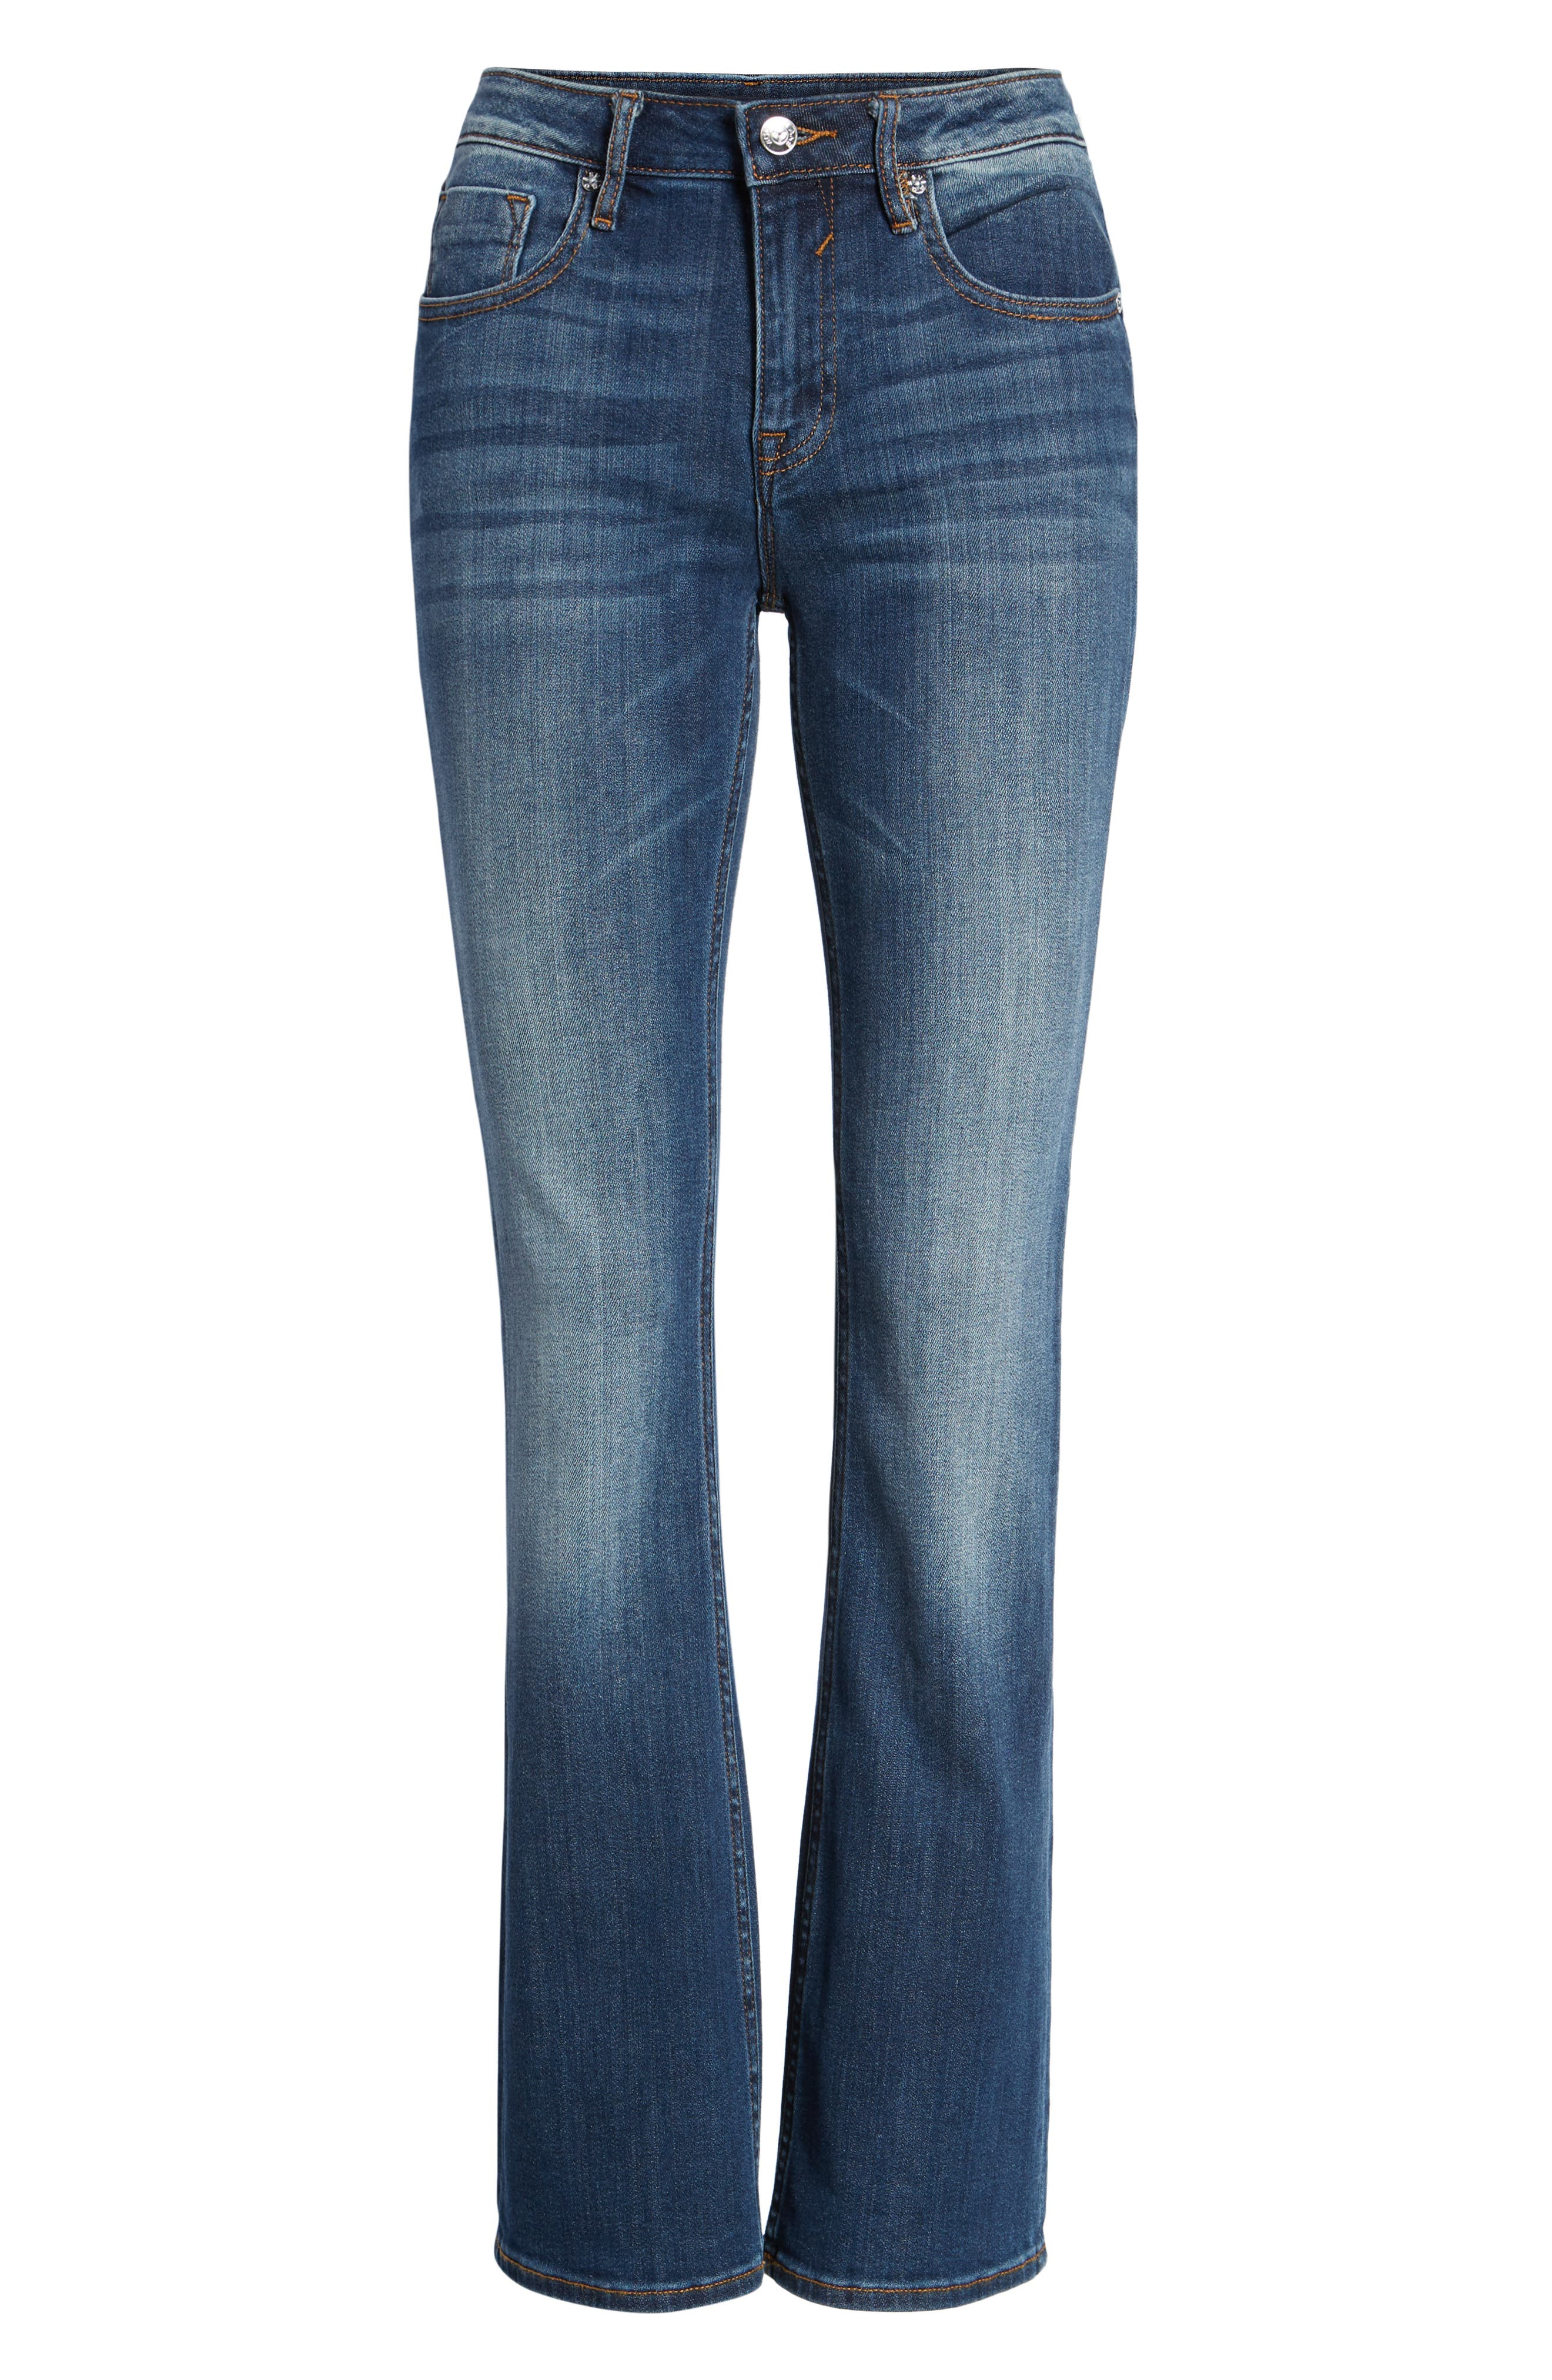 Jagger High Waist Bootcut Jeans,                             Alternate thumbnail 7, color,                             DARK WASH